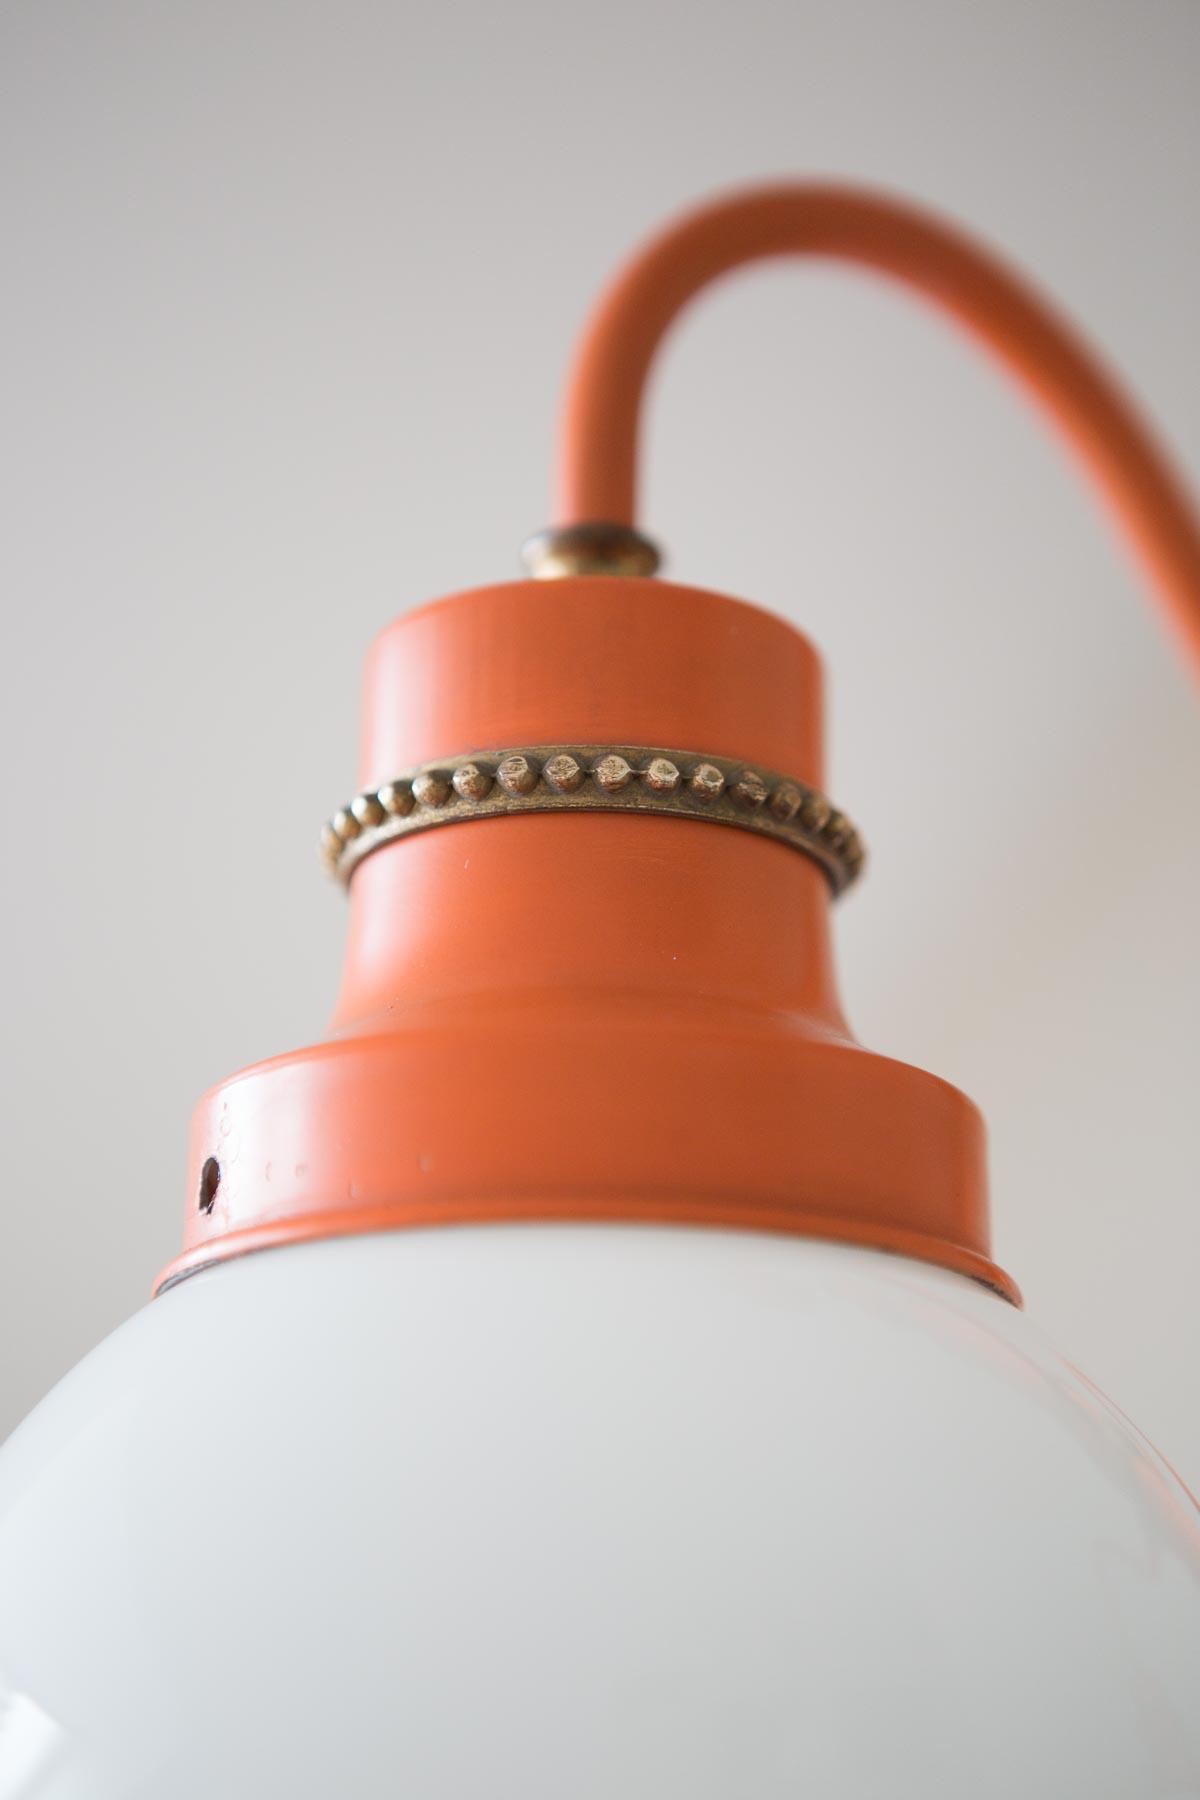 Lámpara techo años 70VENDIDAVintage Chic And naranja tCsrhQd